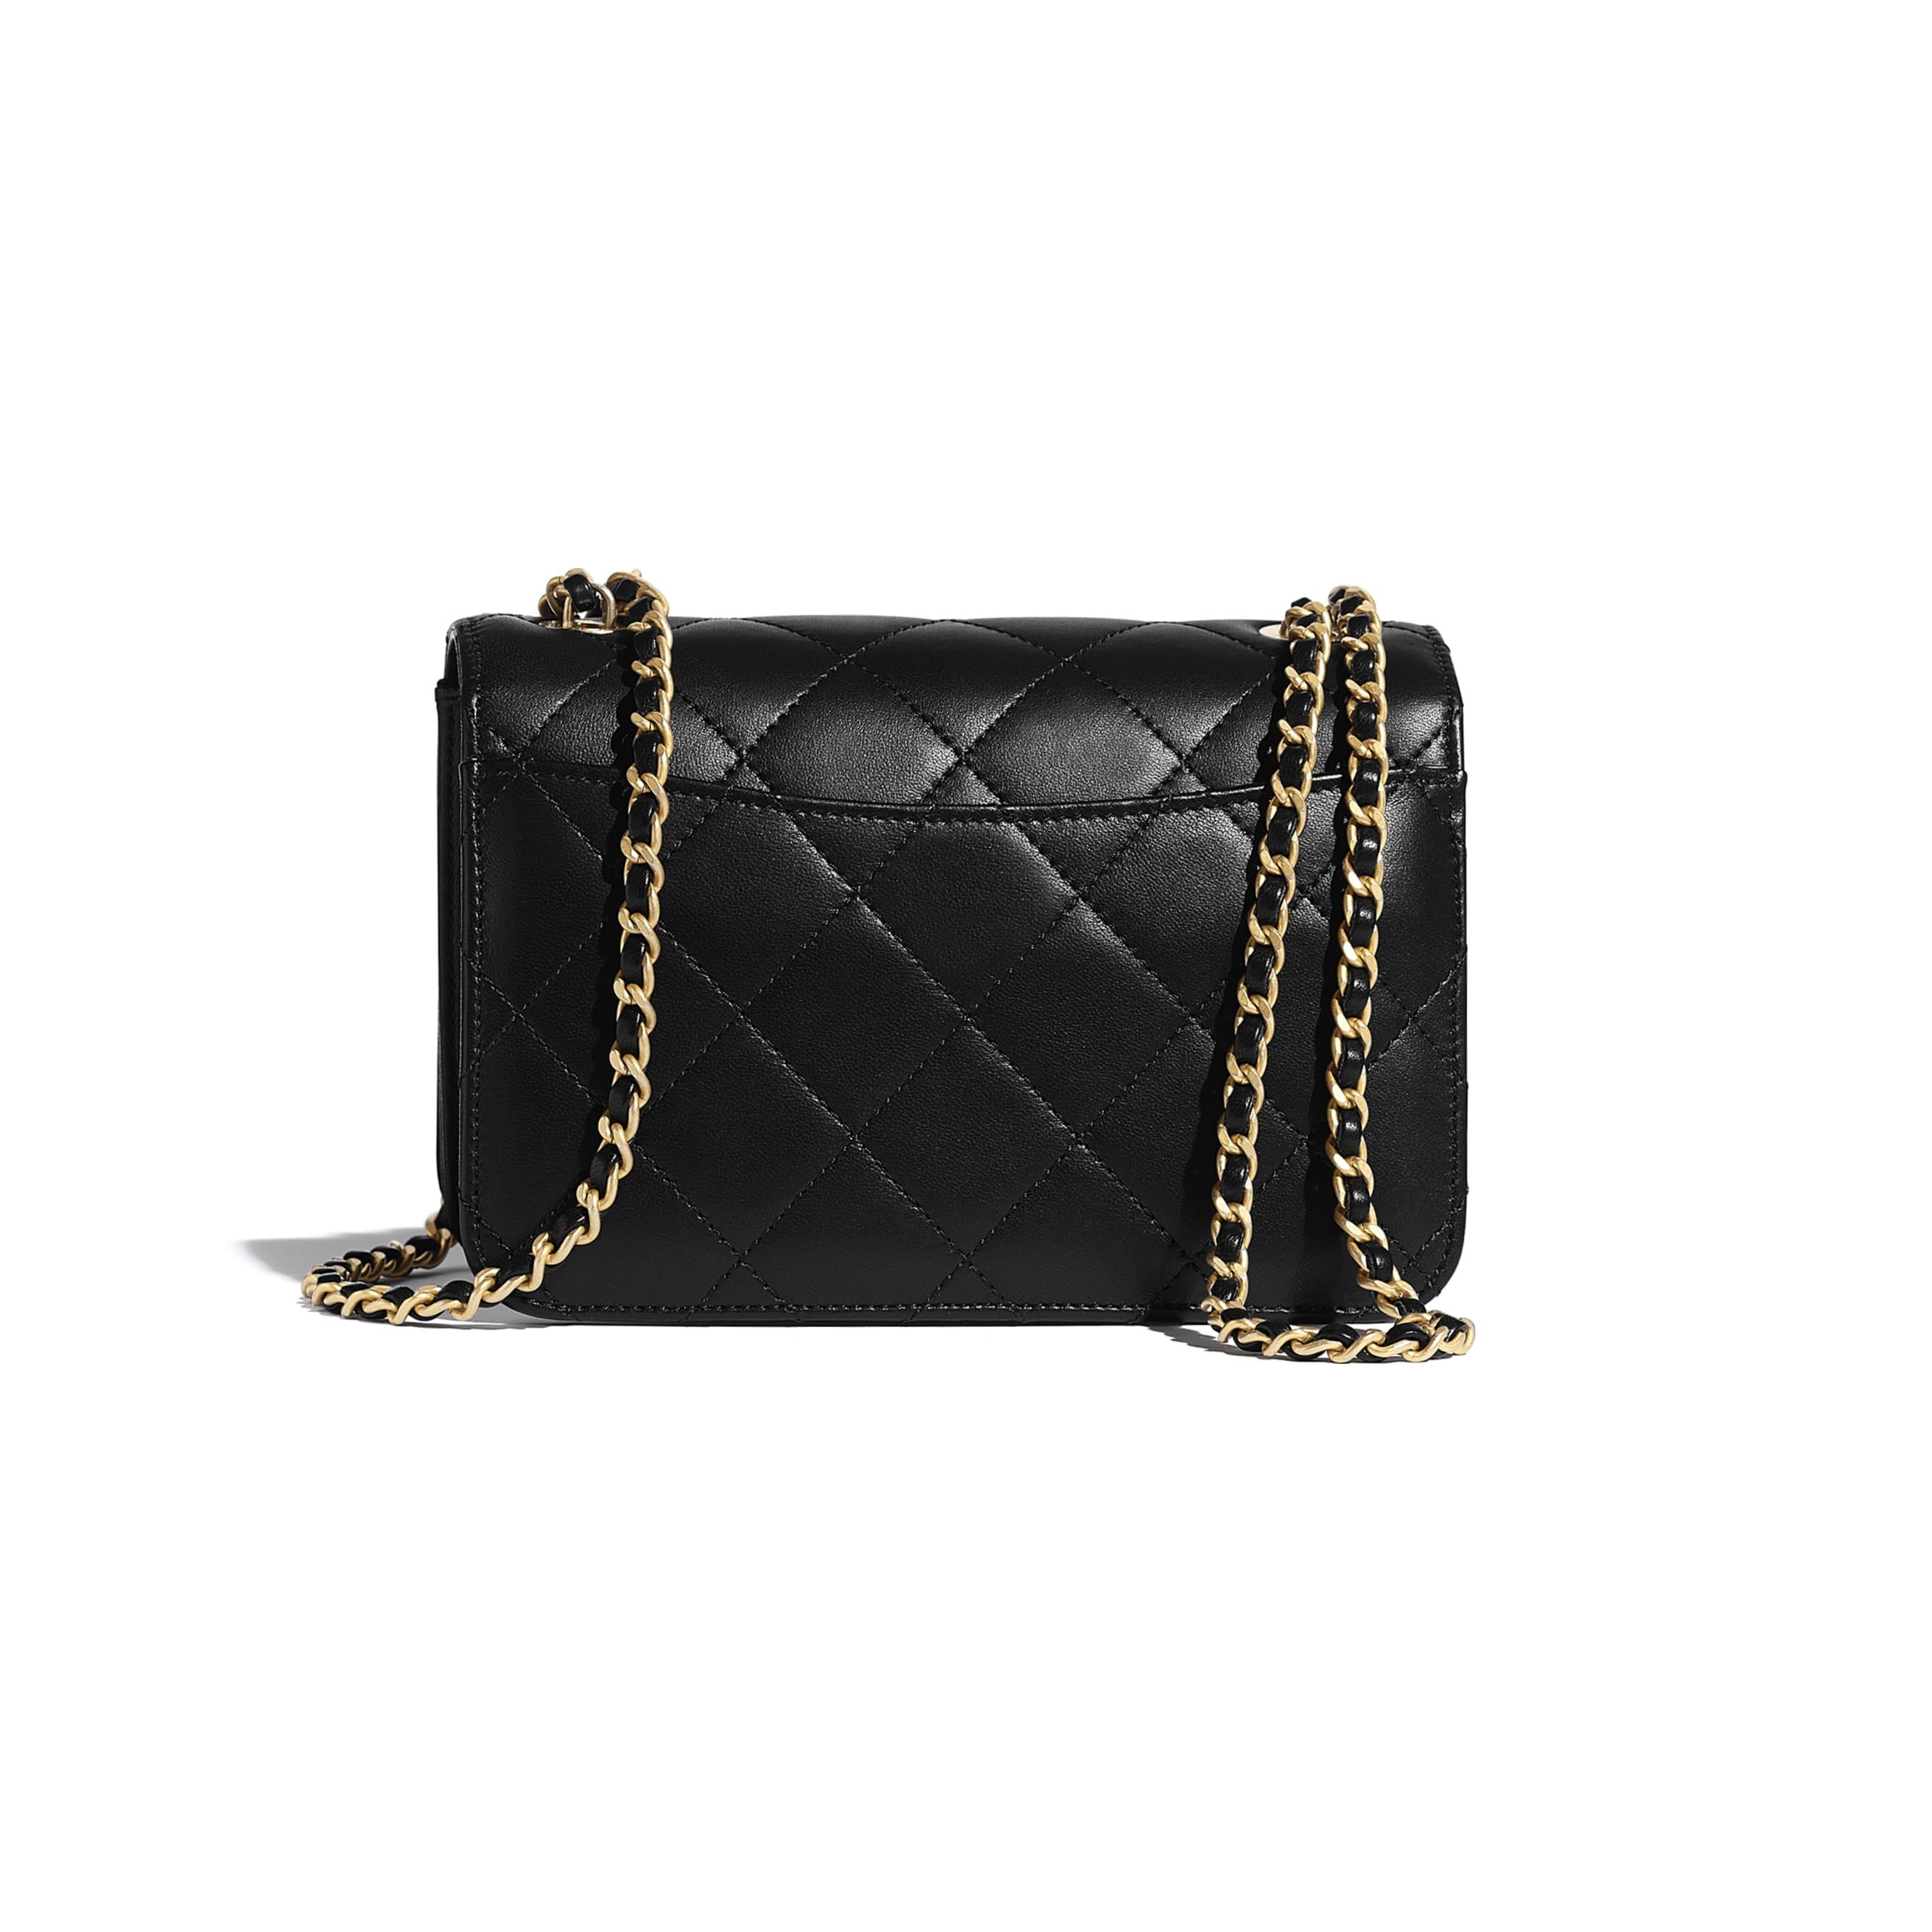 Bolsa - Black & White - Calfskin, Crystal Pearls, Resin & Gold-Tone Metal - CHANEL - Vista alternativa - ver a versão em tamanho standard